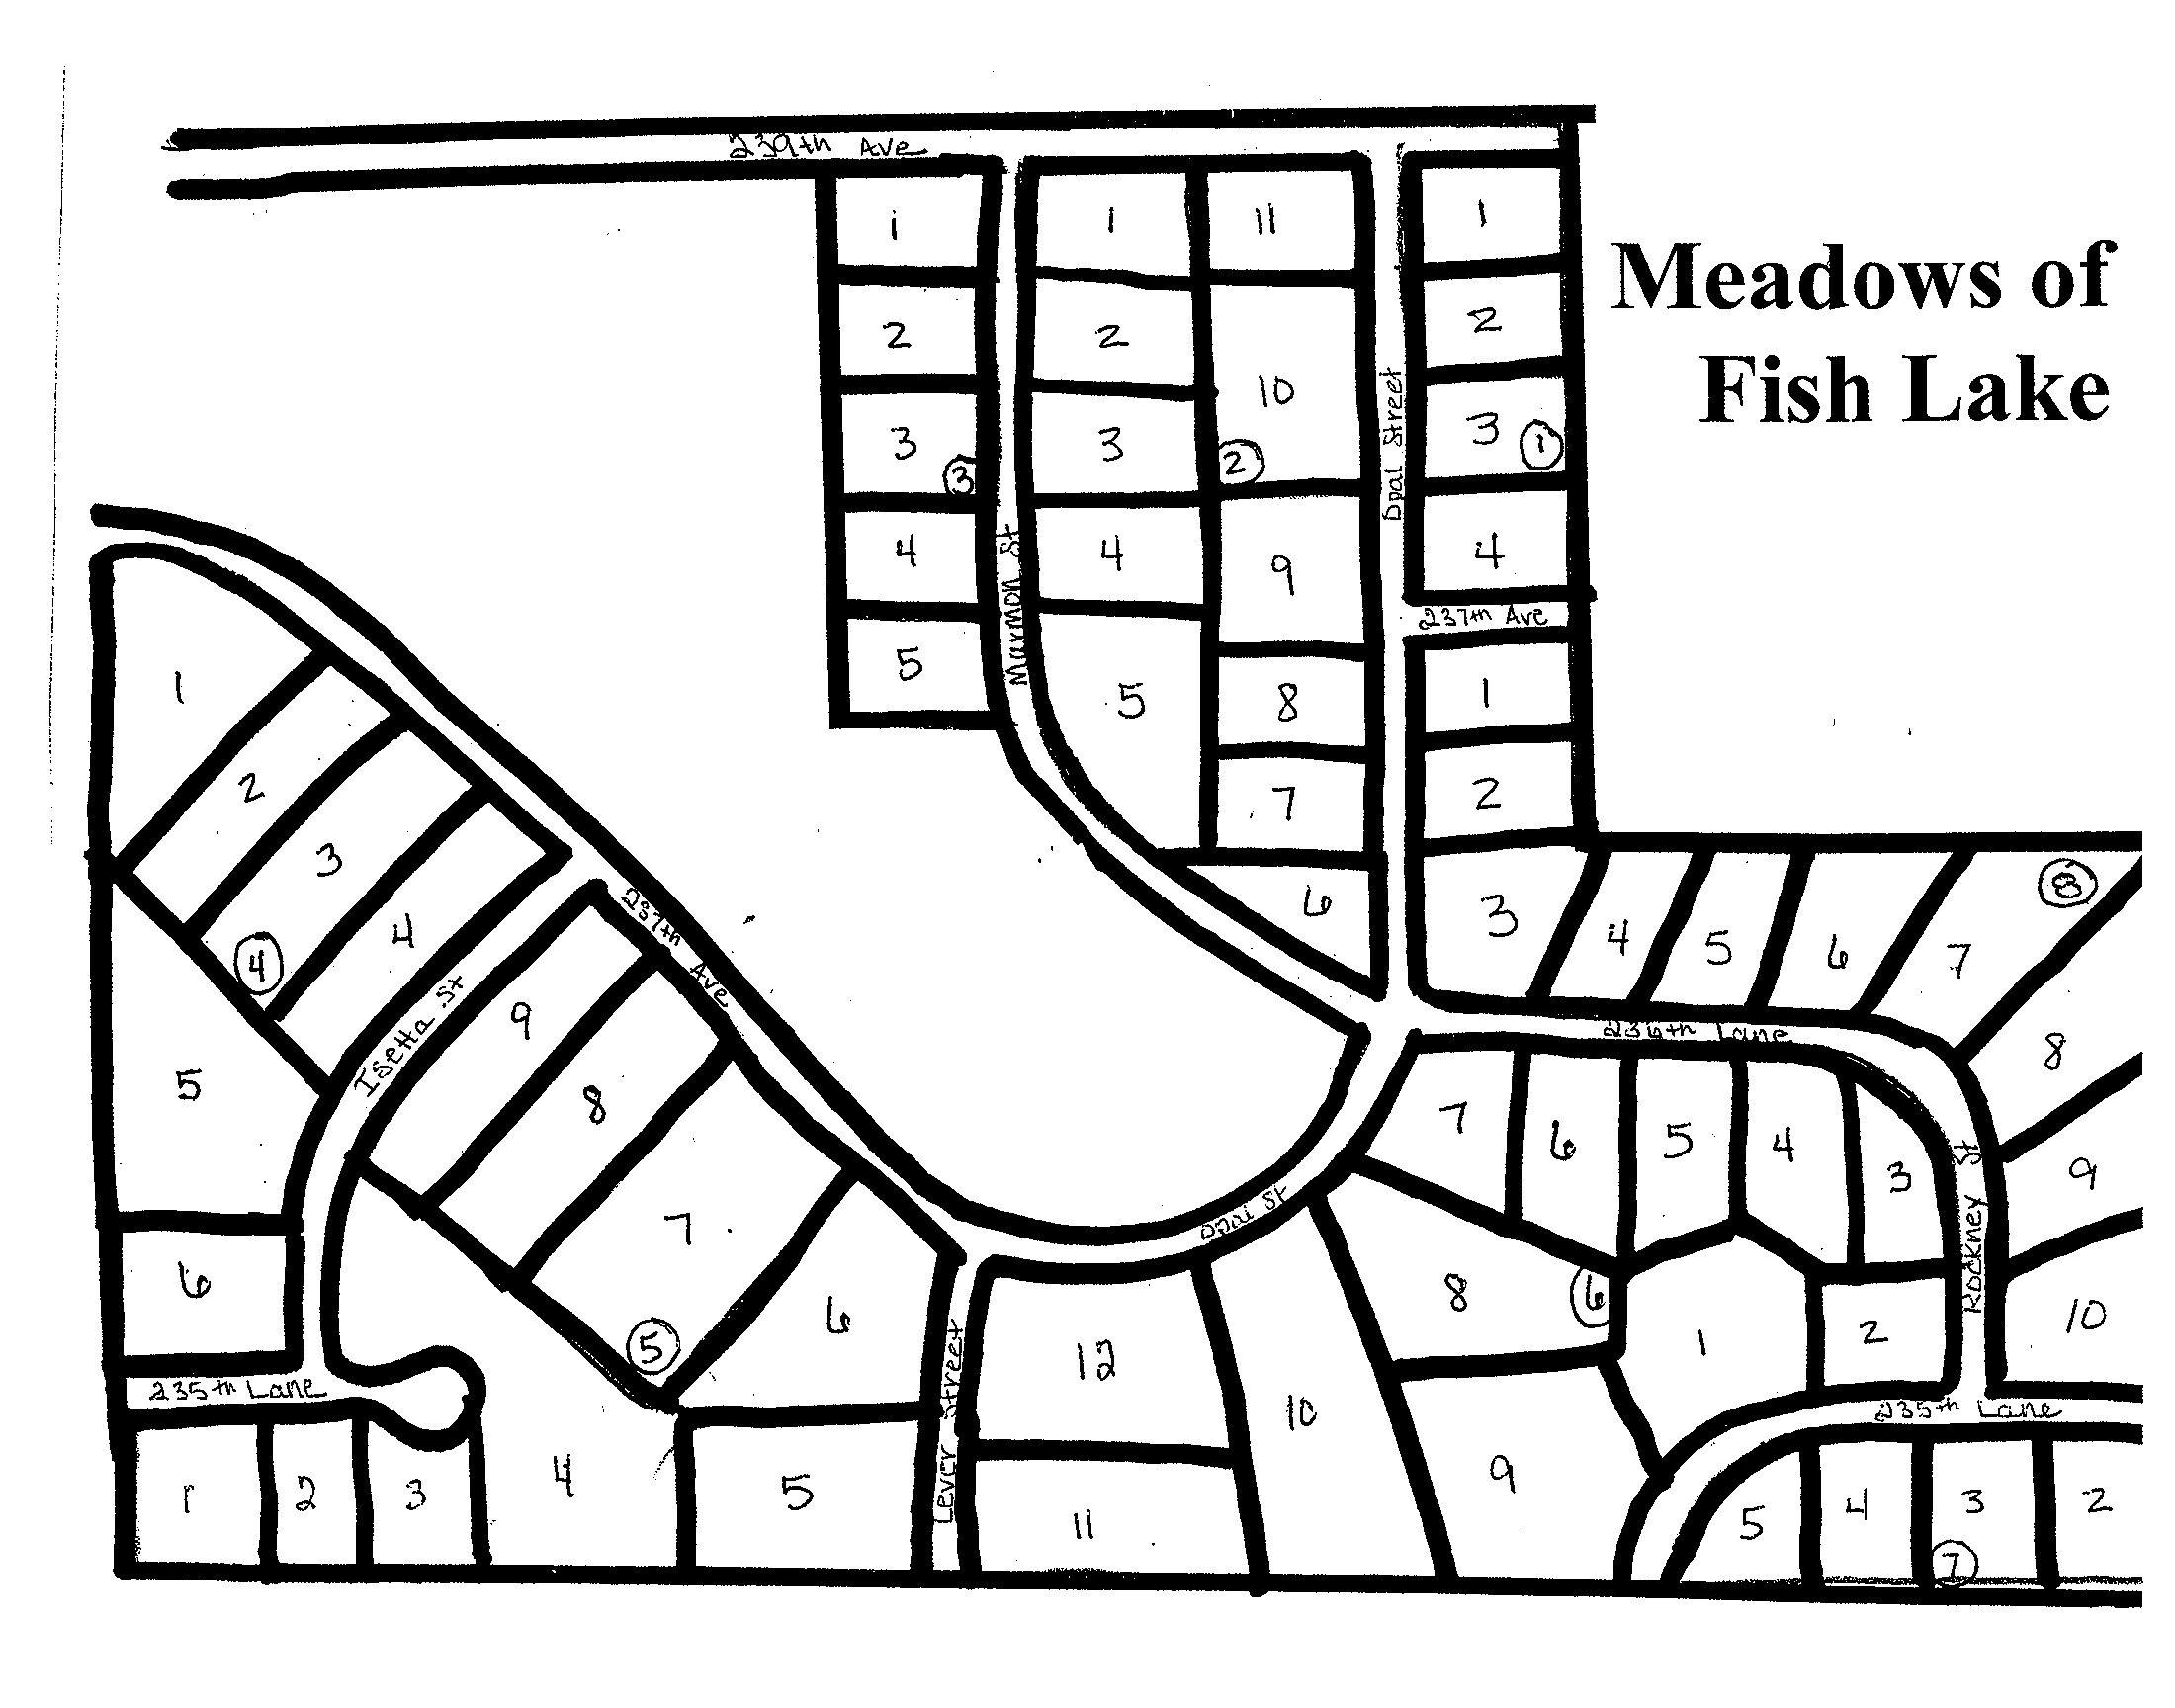 Meadows of Fish Lake plat